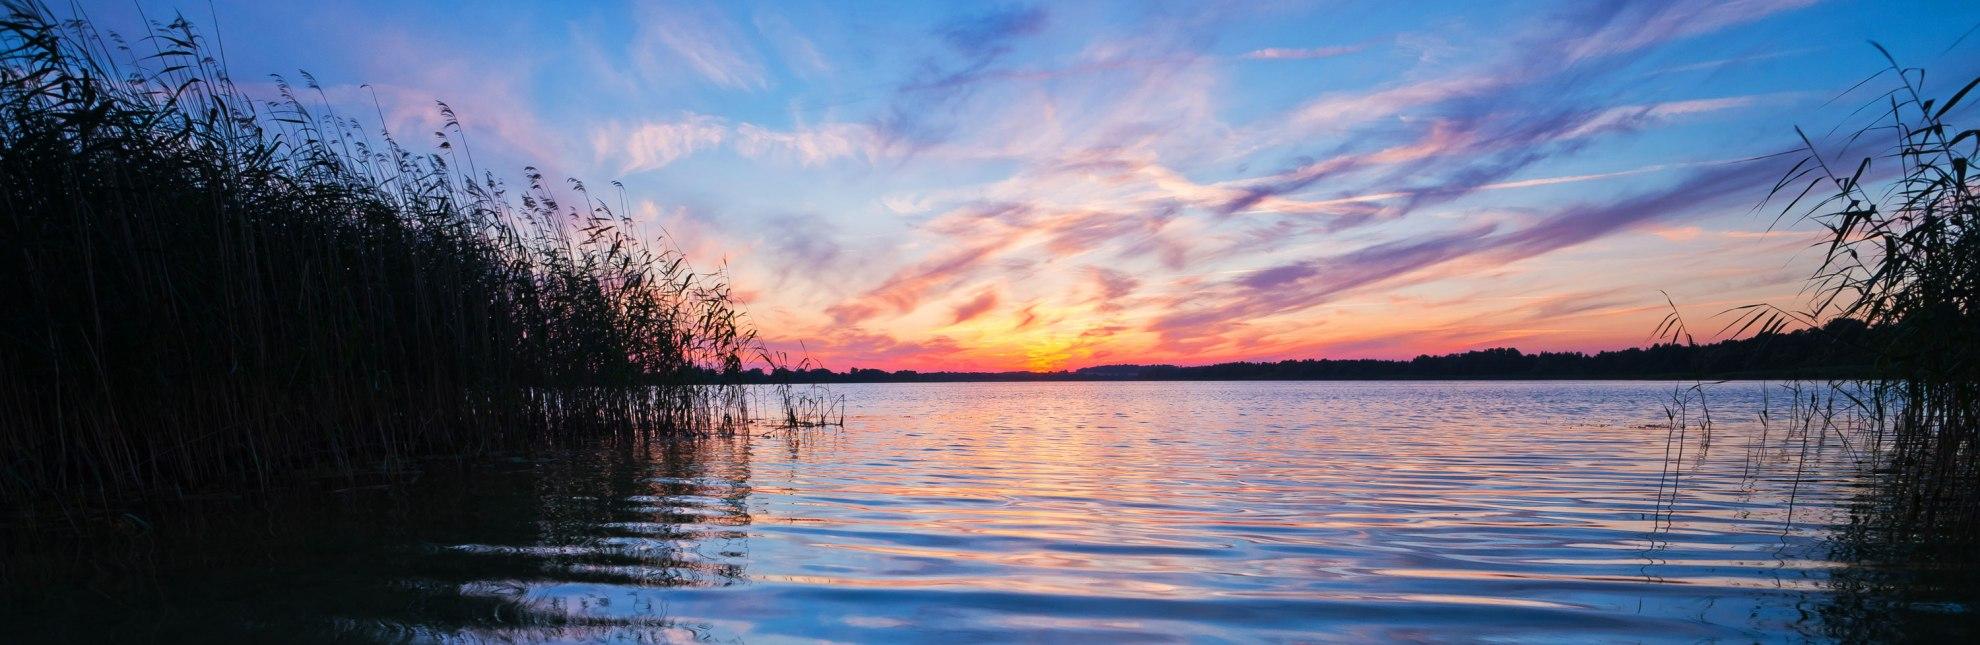 Sonnenuntergang am Mechower See, © Thomas Ebelt / HLMS GmbH